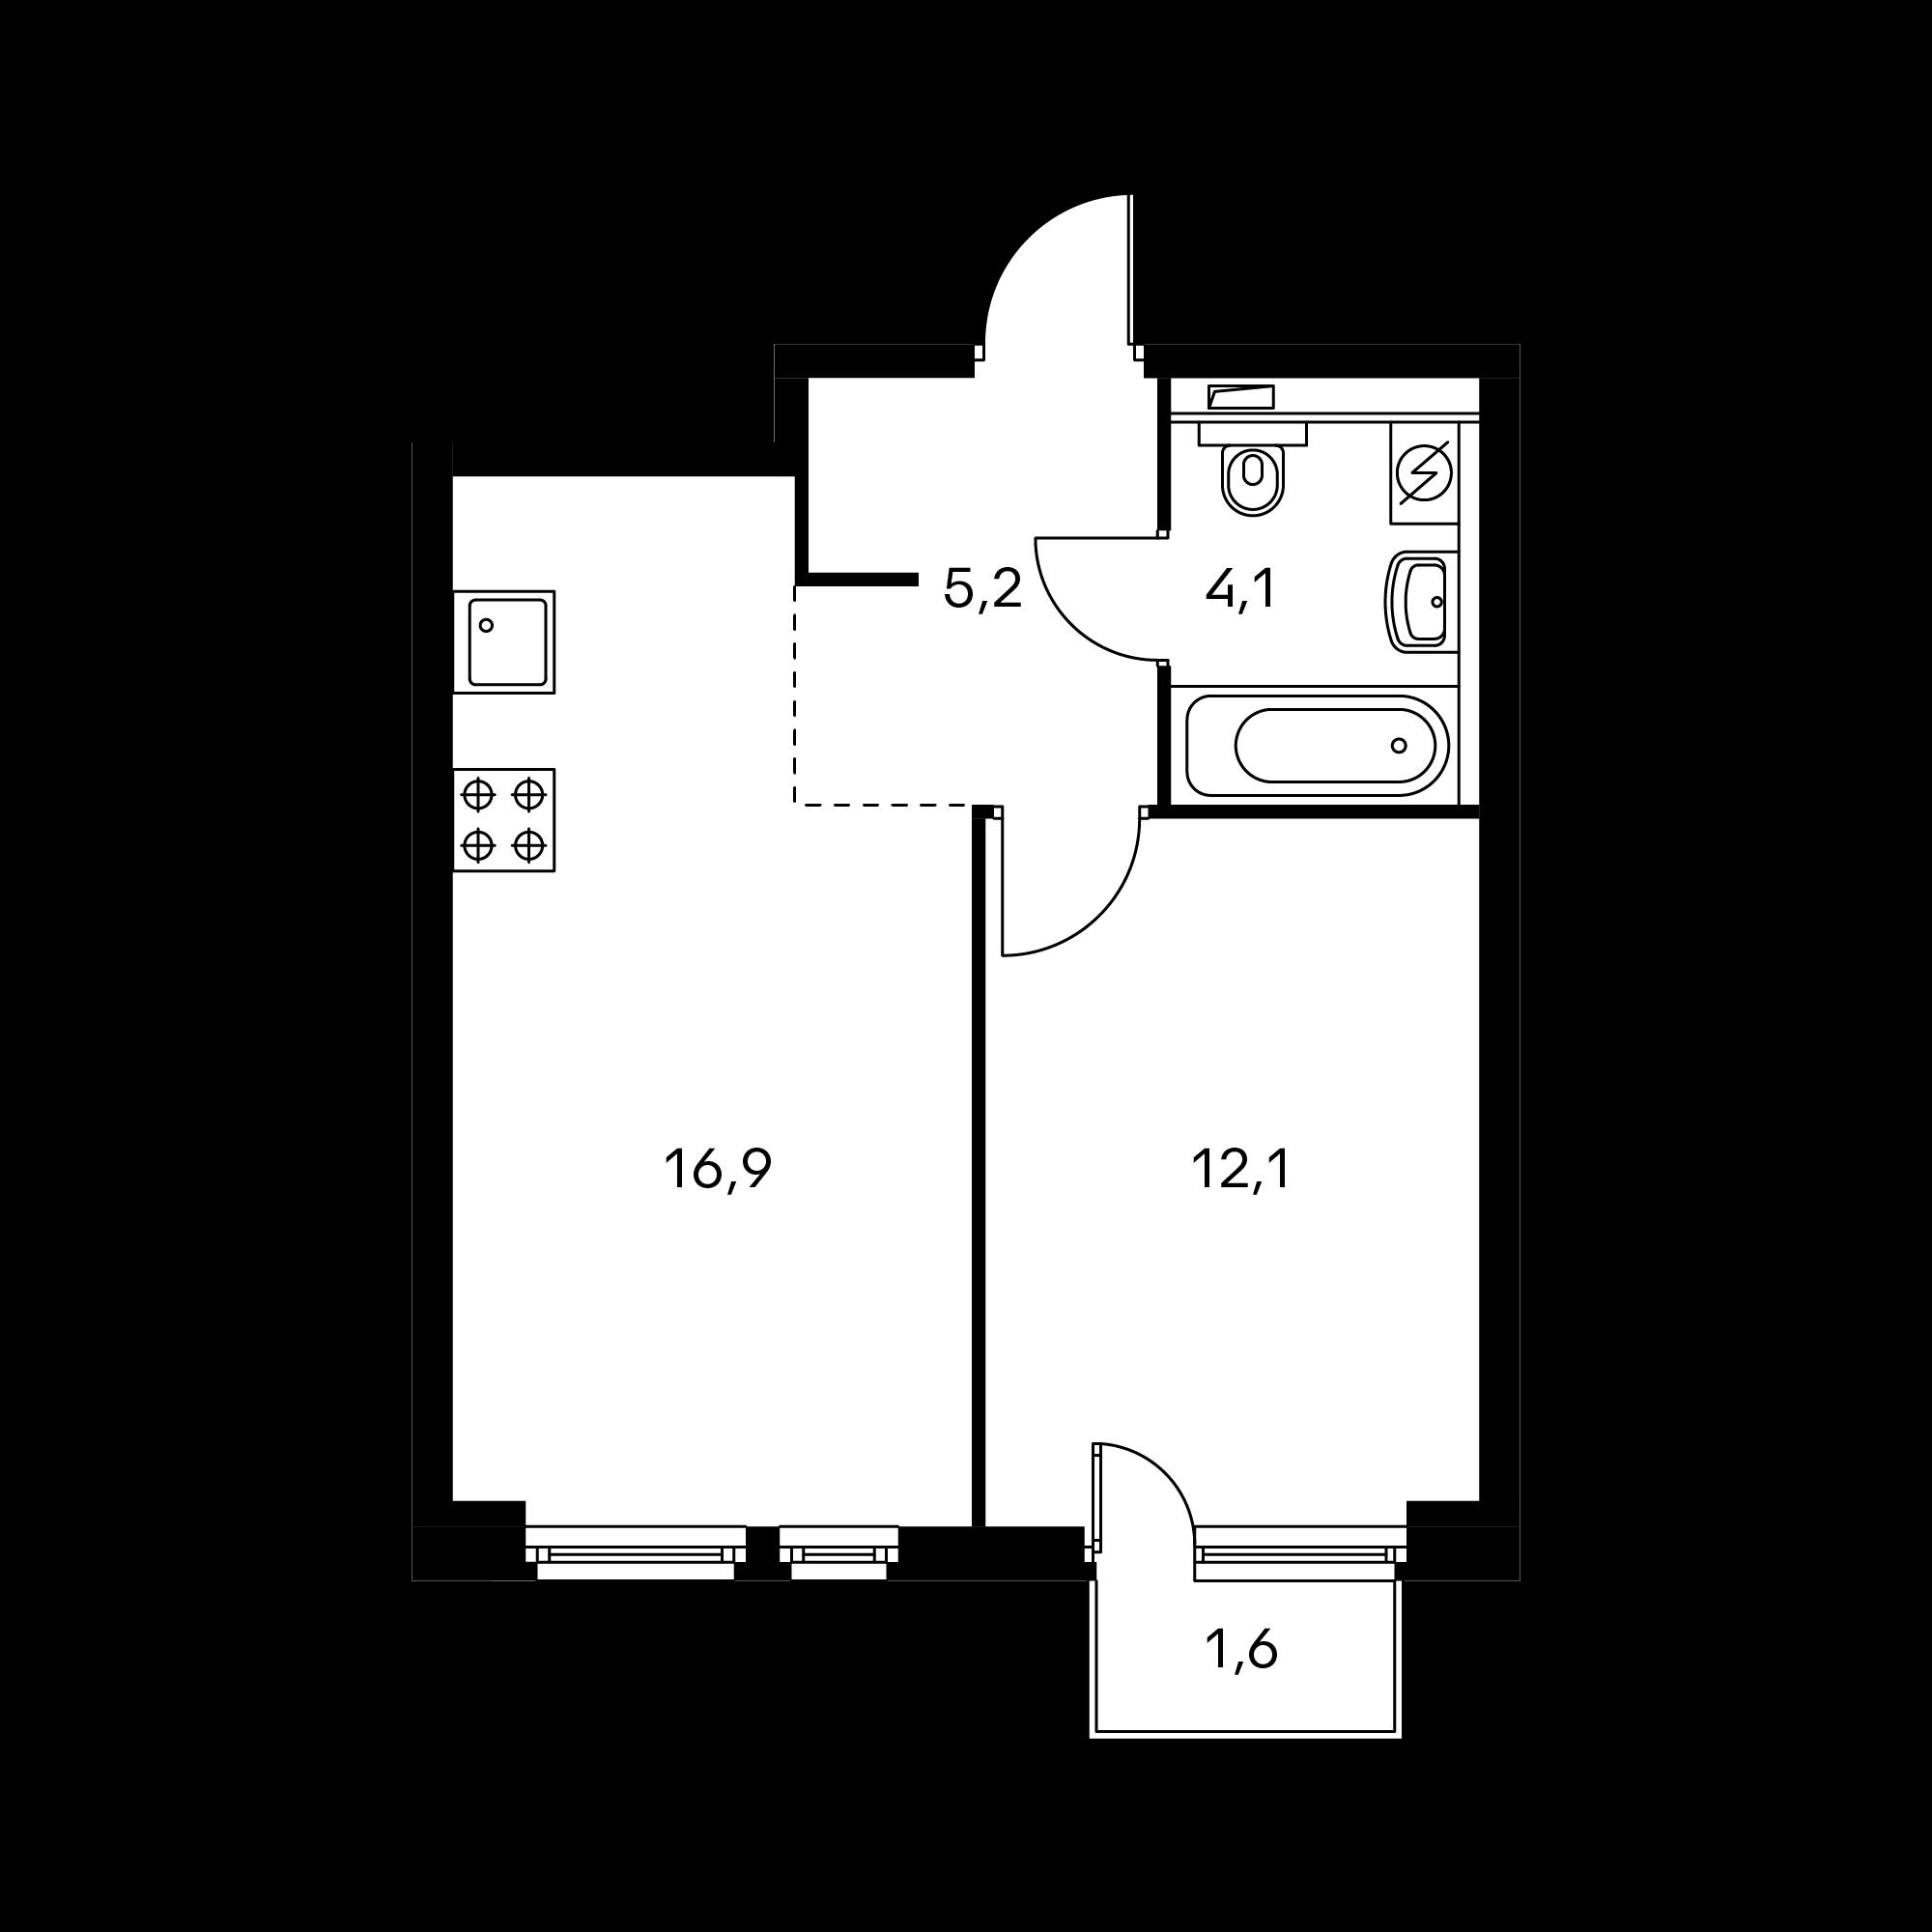 1ES3_6.3-1B1*